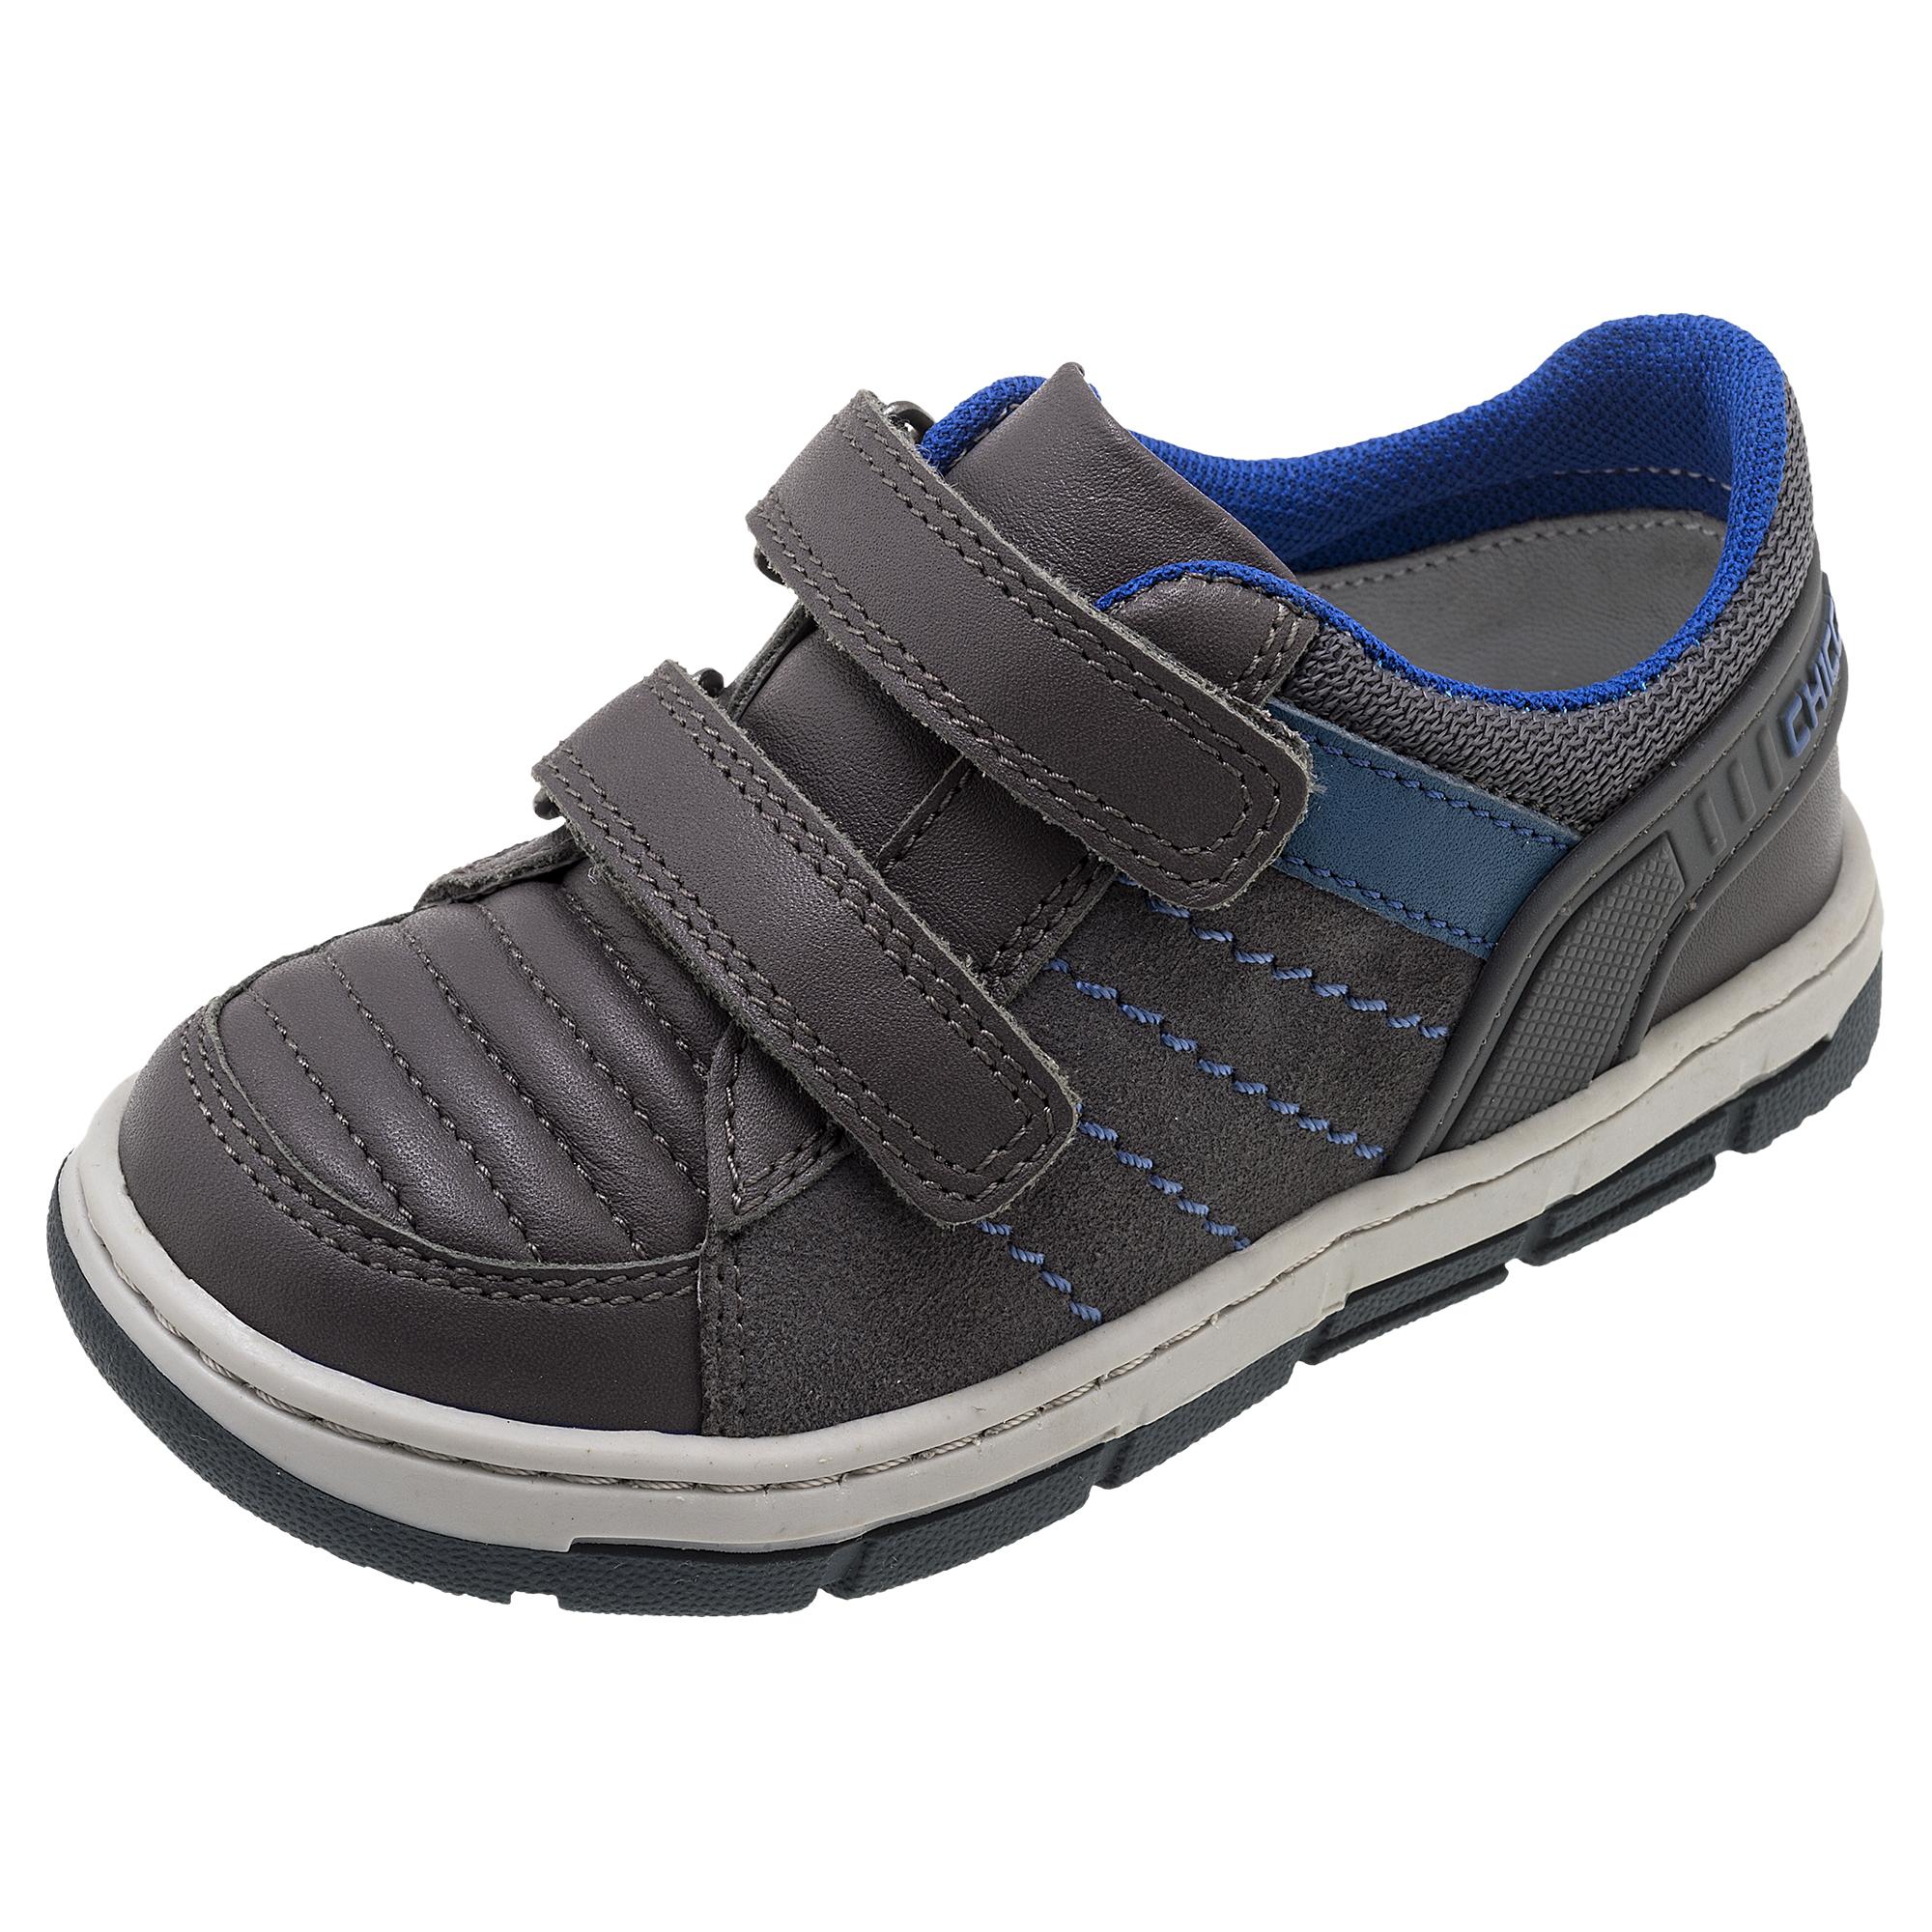 Pantof sport copii Chicco, gri inchis